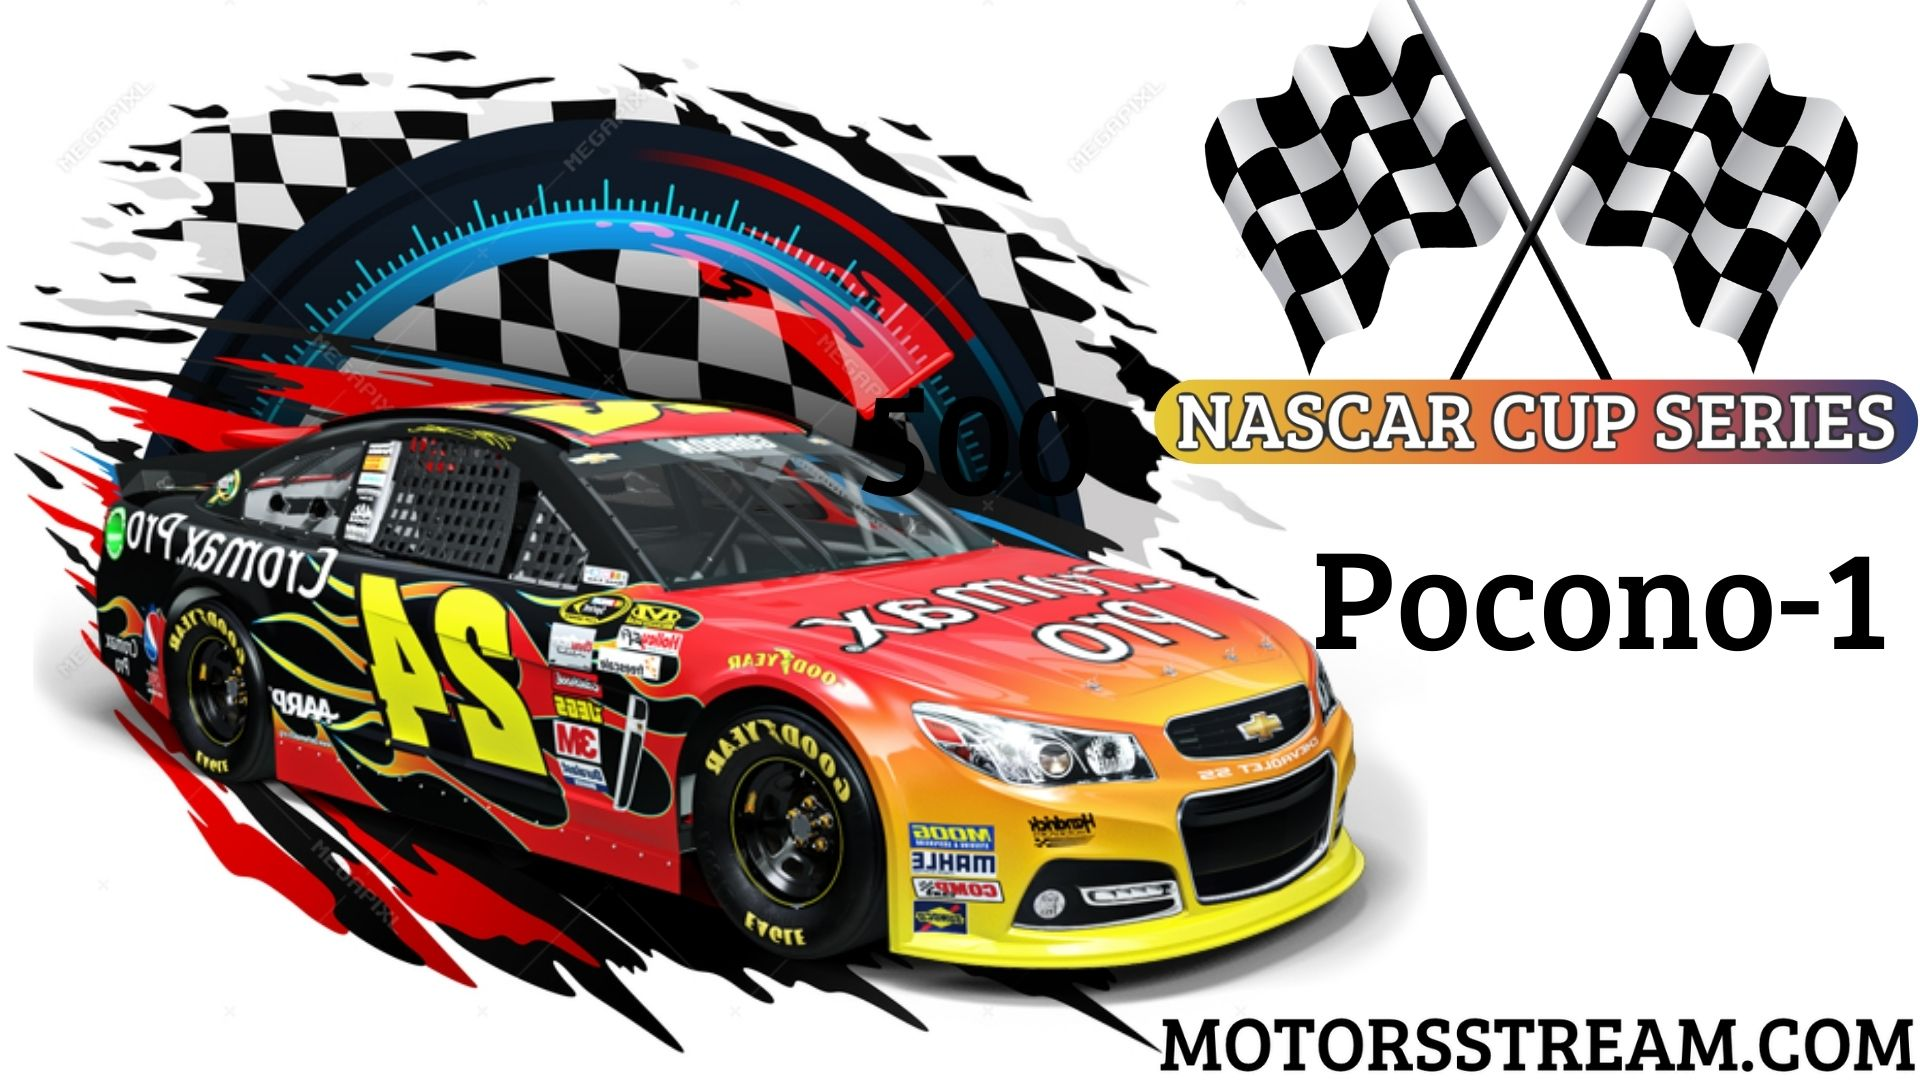 NASCAR Cup Series Pocono 325 Race Live Stream